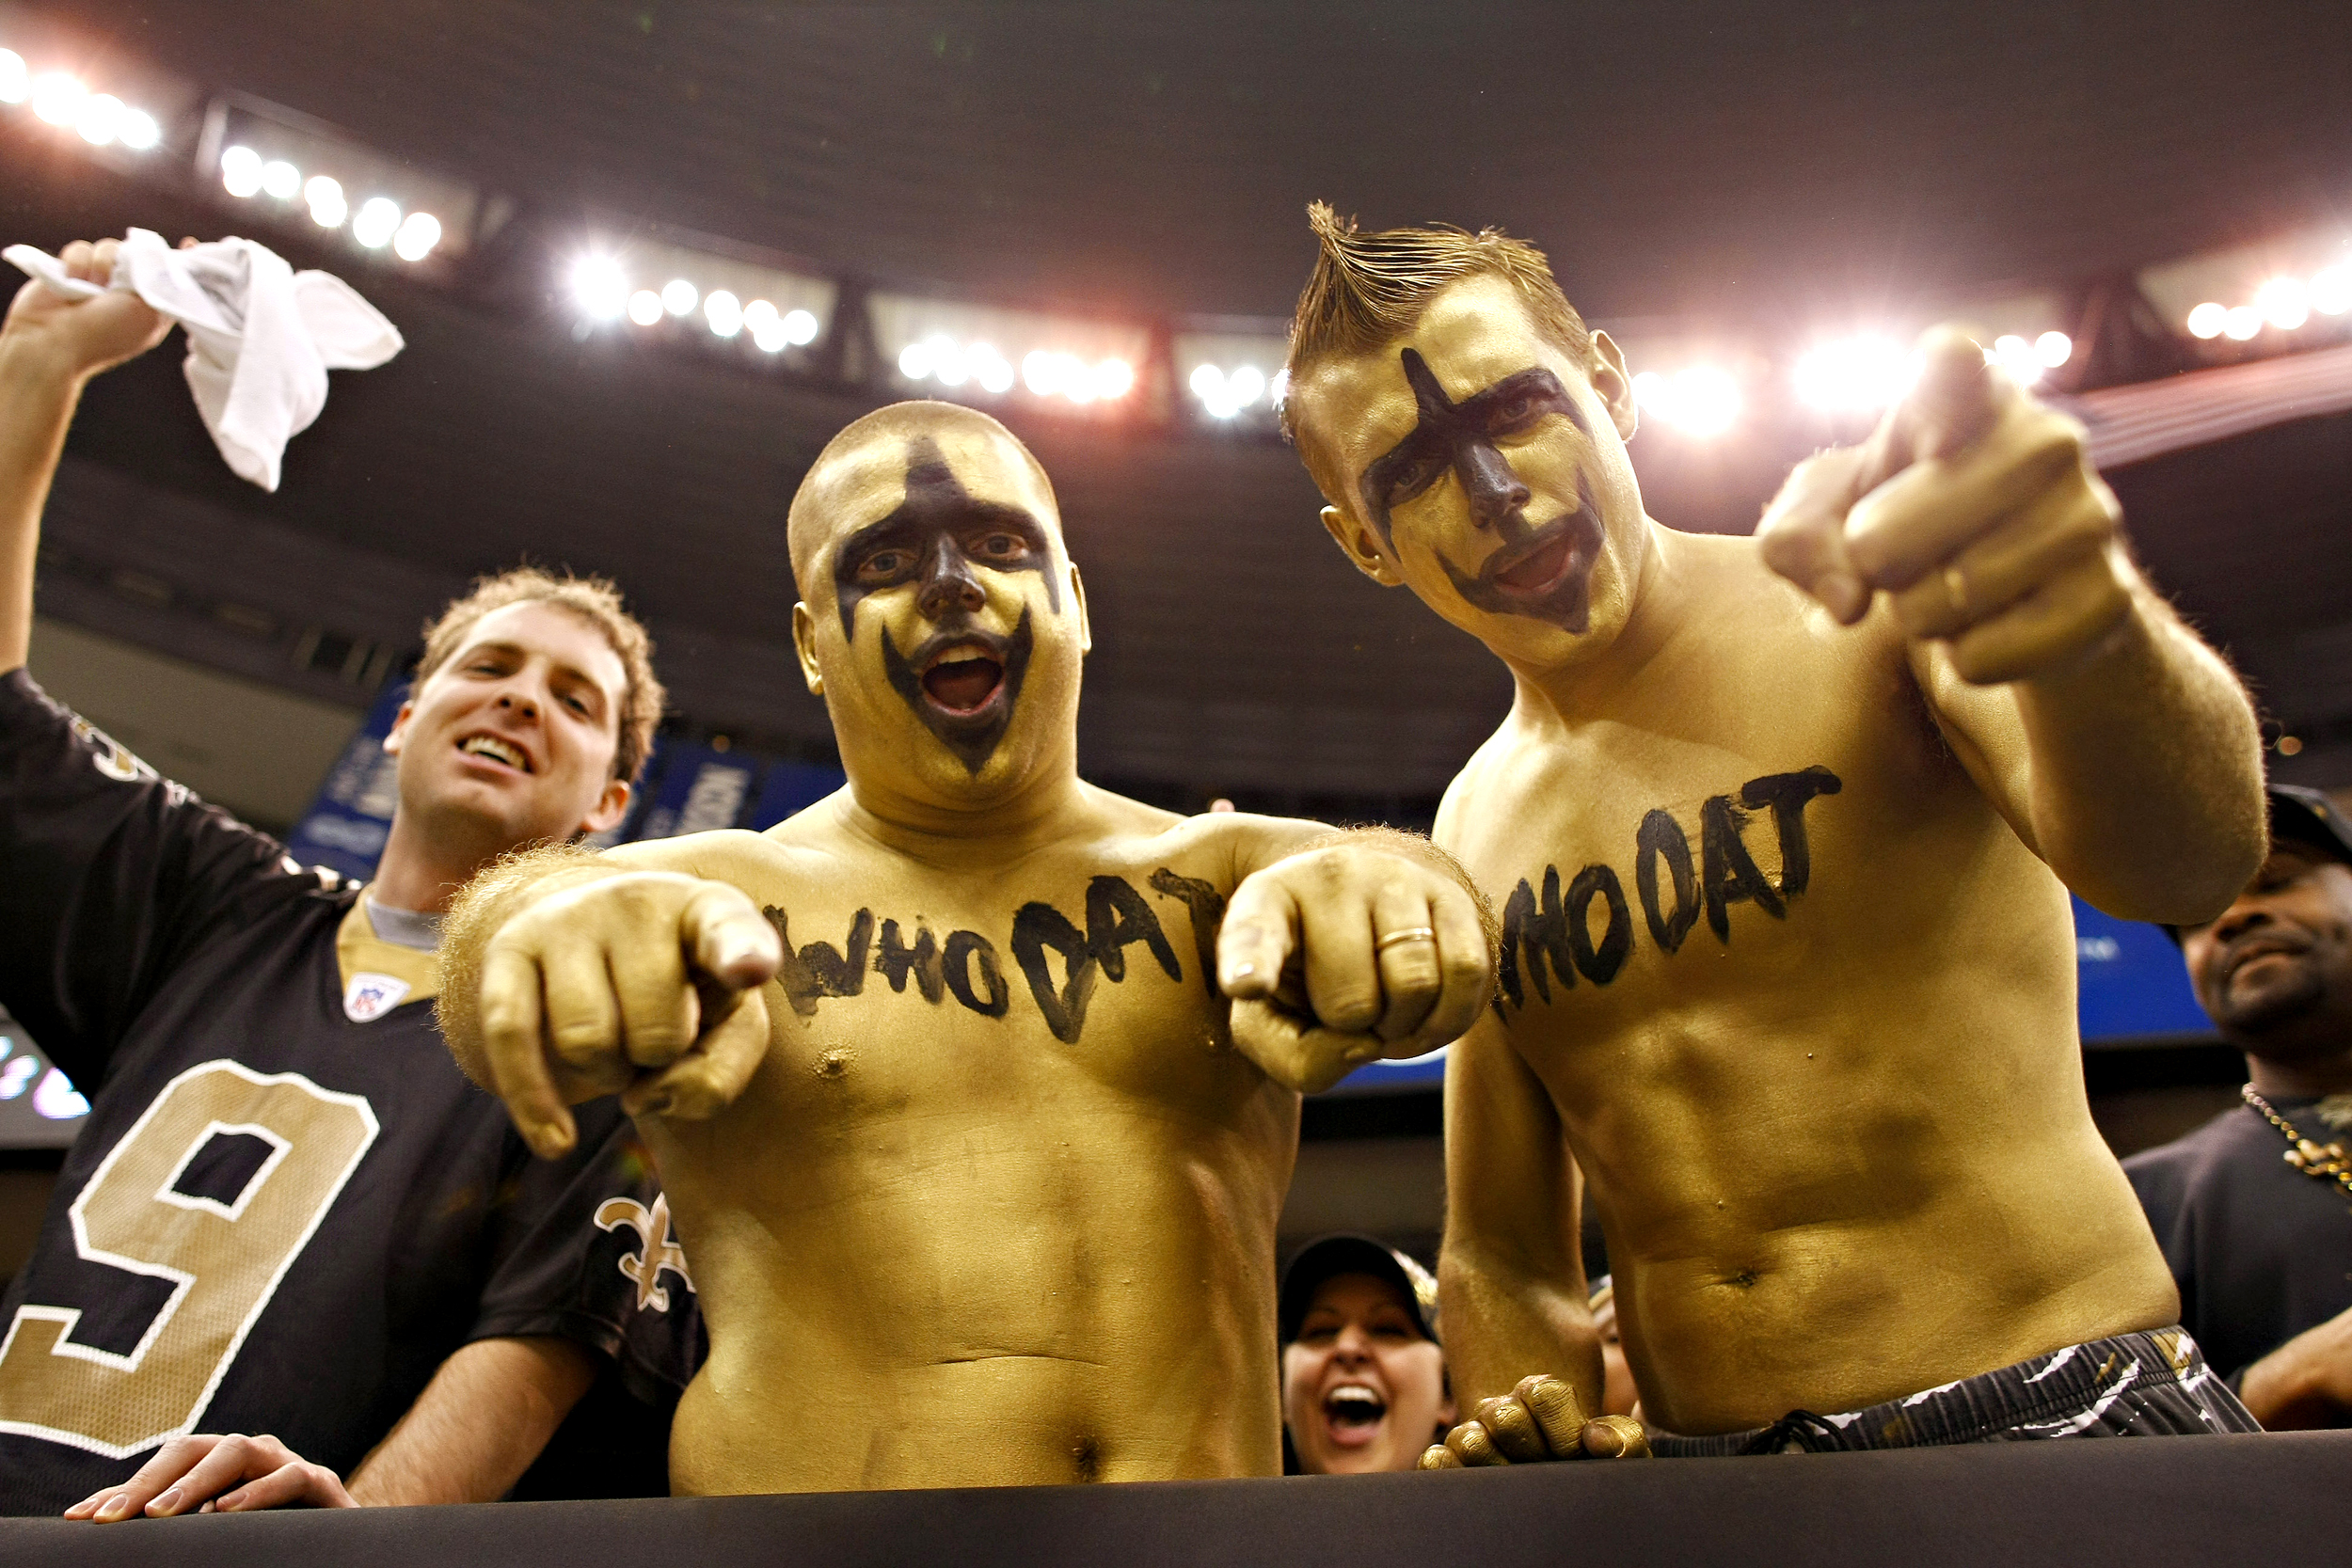 6ef03e0fa Saints fans, still feeling sting of loss, boycott Super Bowl with New  Orleans flair